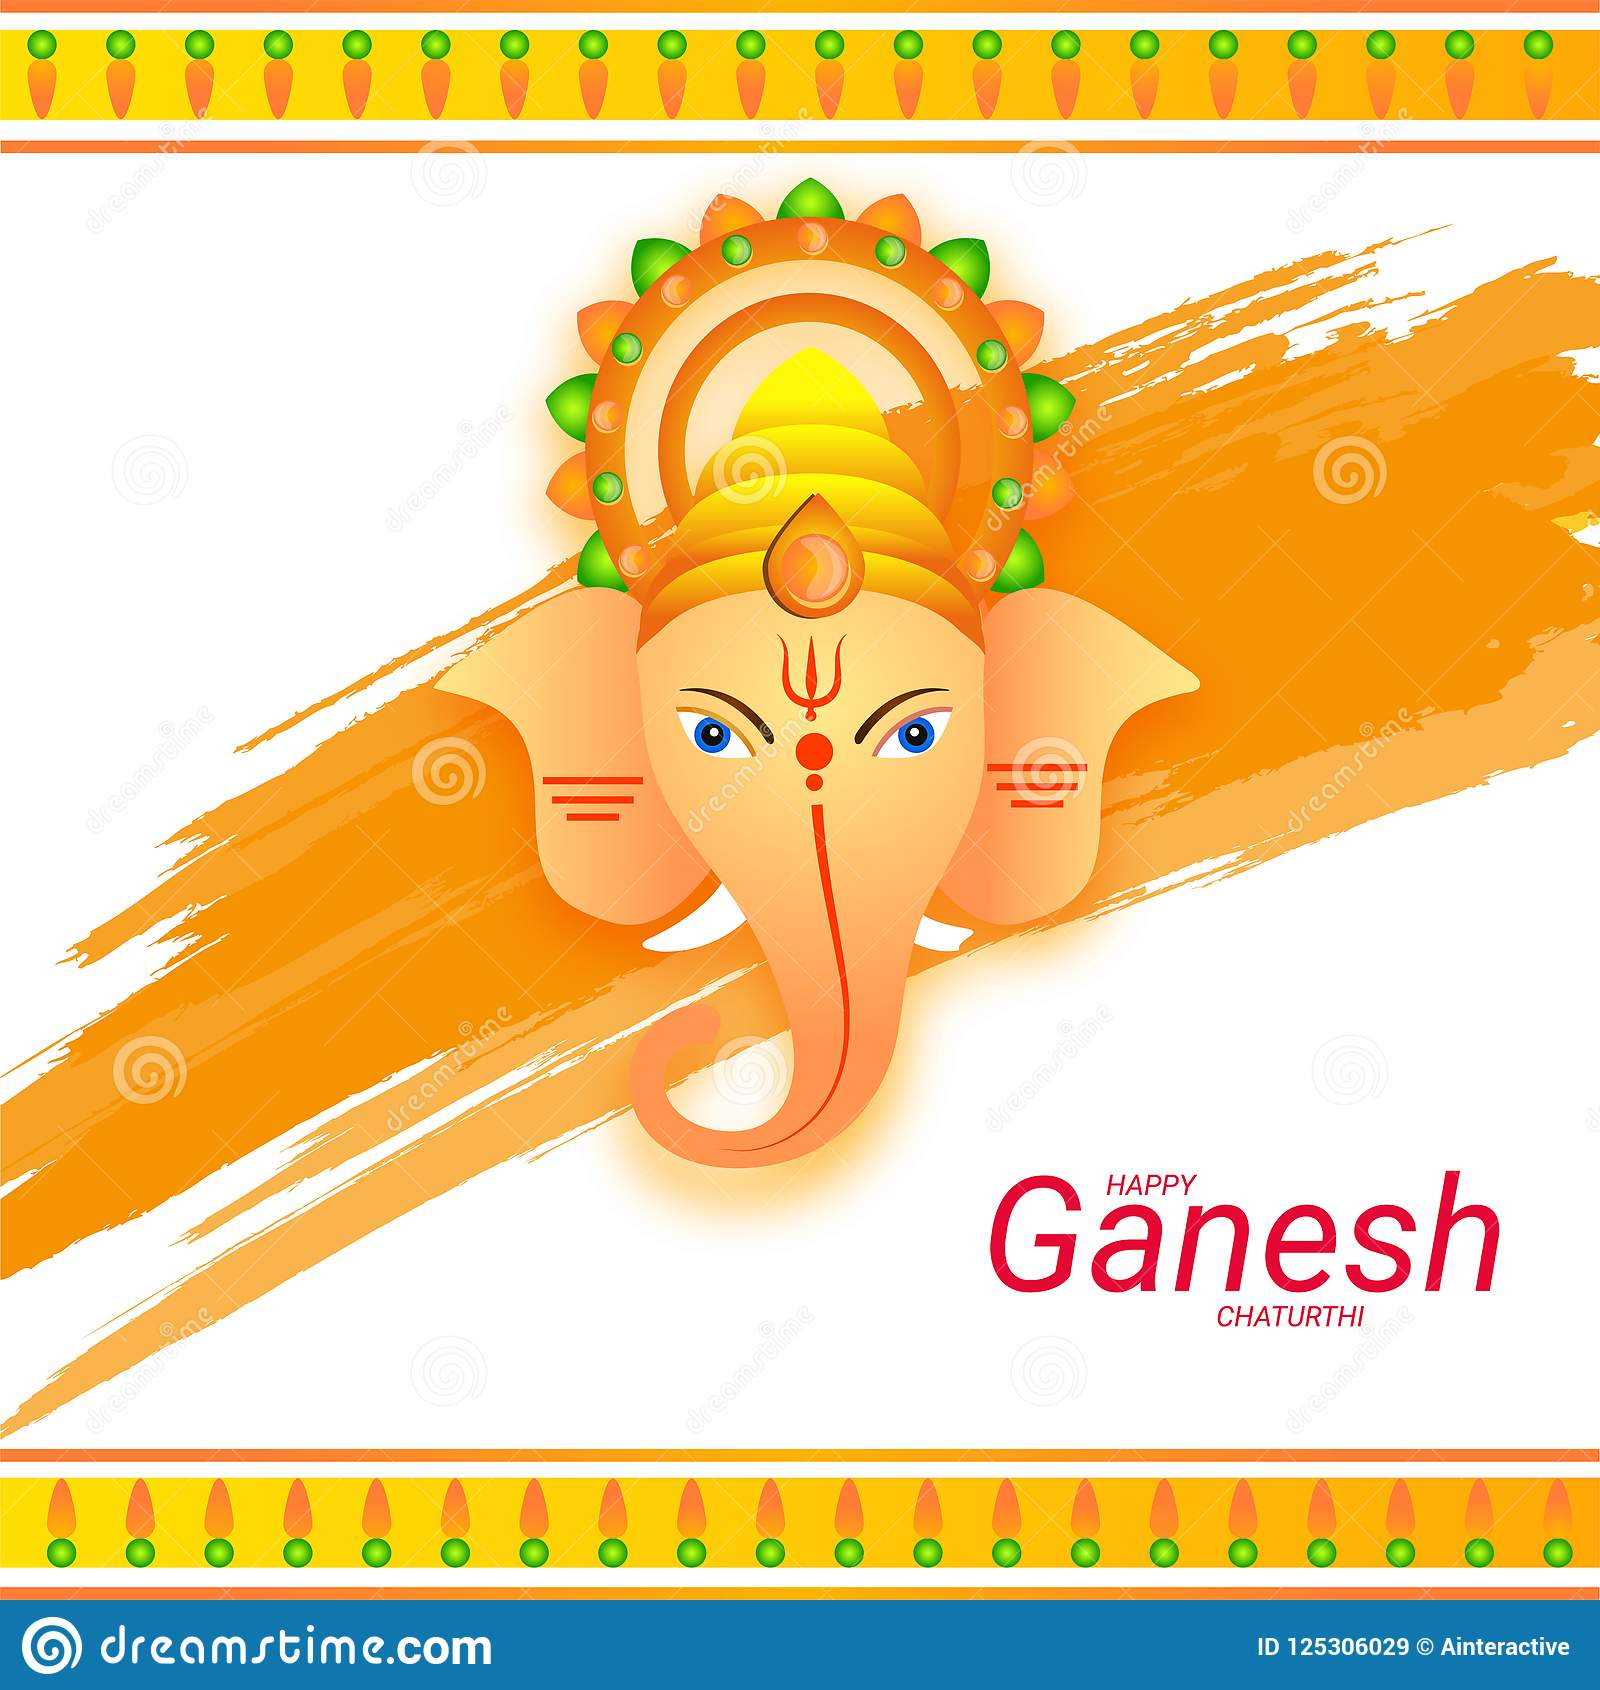 Happy ganesh chaturthi greeting card design with lord ganesha fa download happy ganesh chaturthi greeting card design with lord ganesha fa stock illustration illustration of m4hsunfo